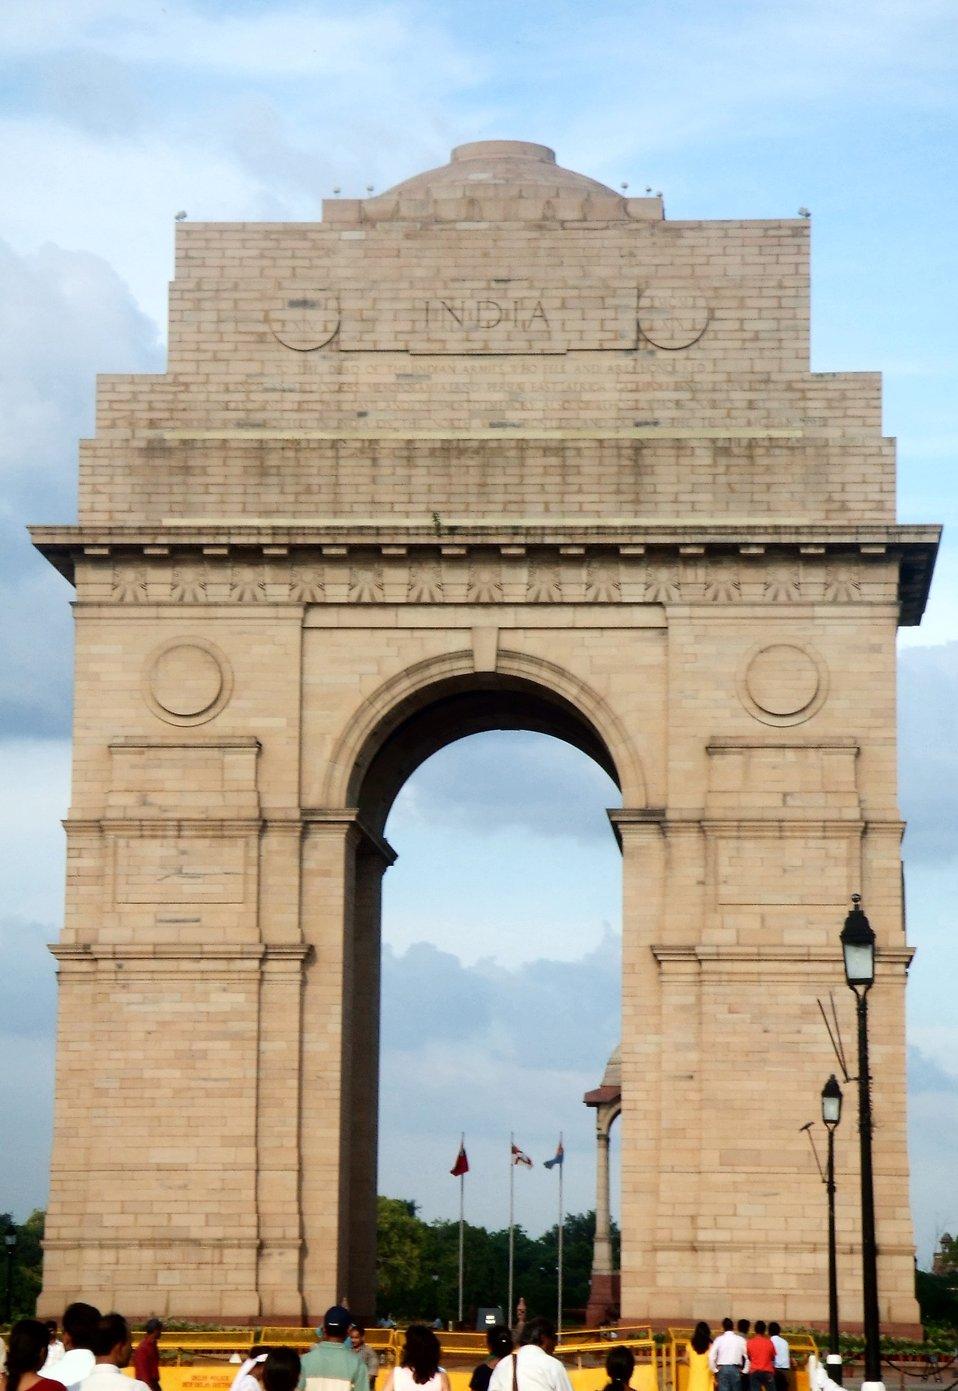 India Gate.